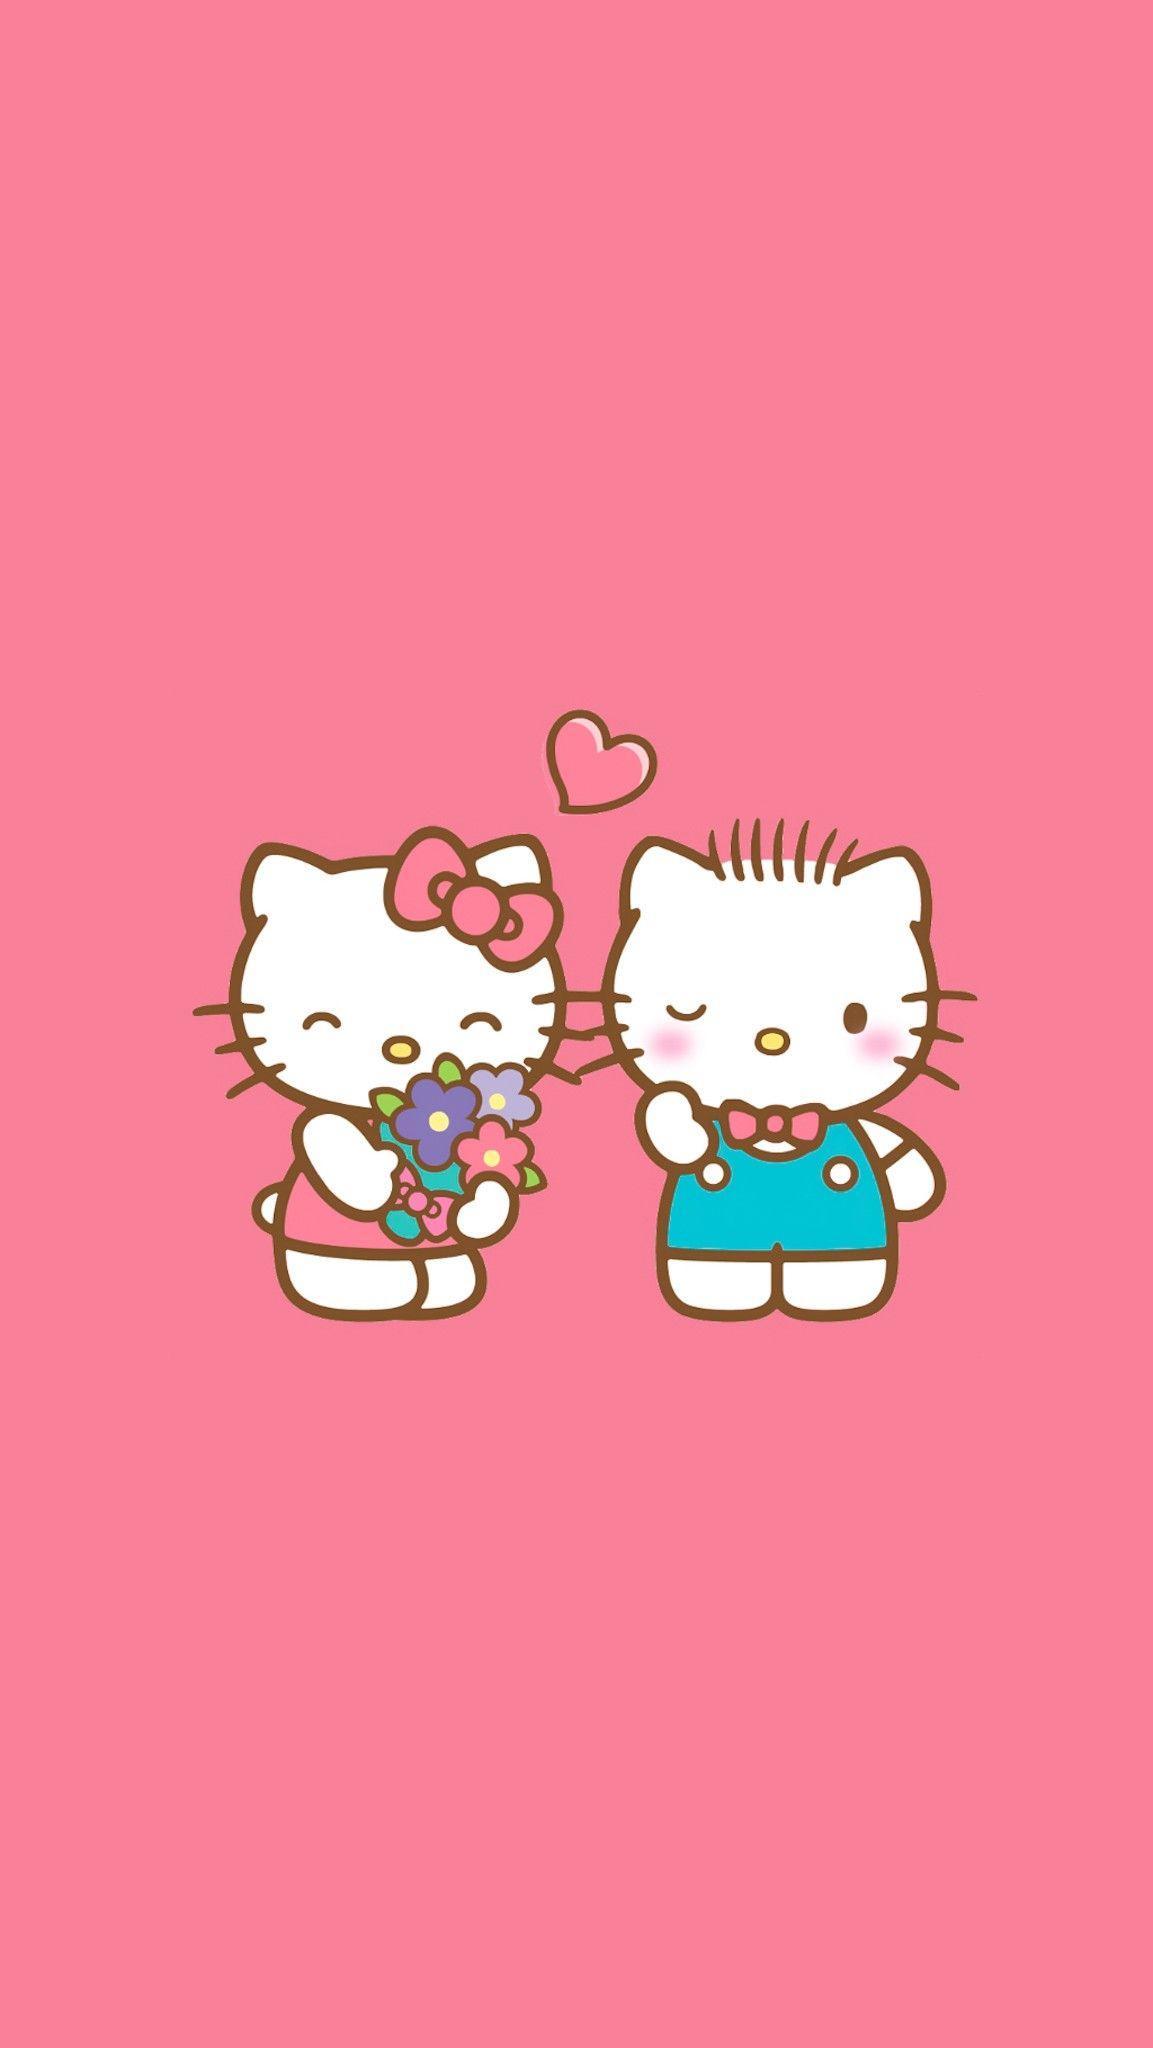 Pin By Aekkalisa On Hello Kitty Bg2 Hello Kitty Photos Hello Kitty Pictures Hello Kitty Art